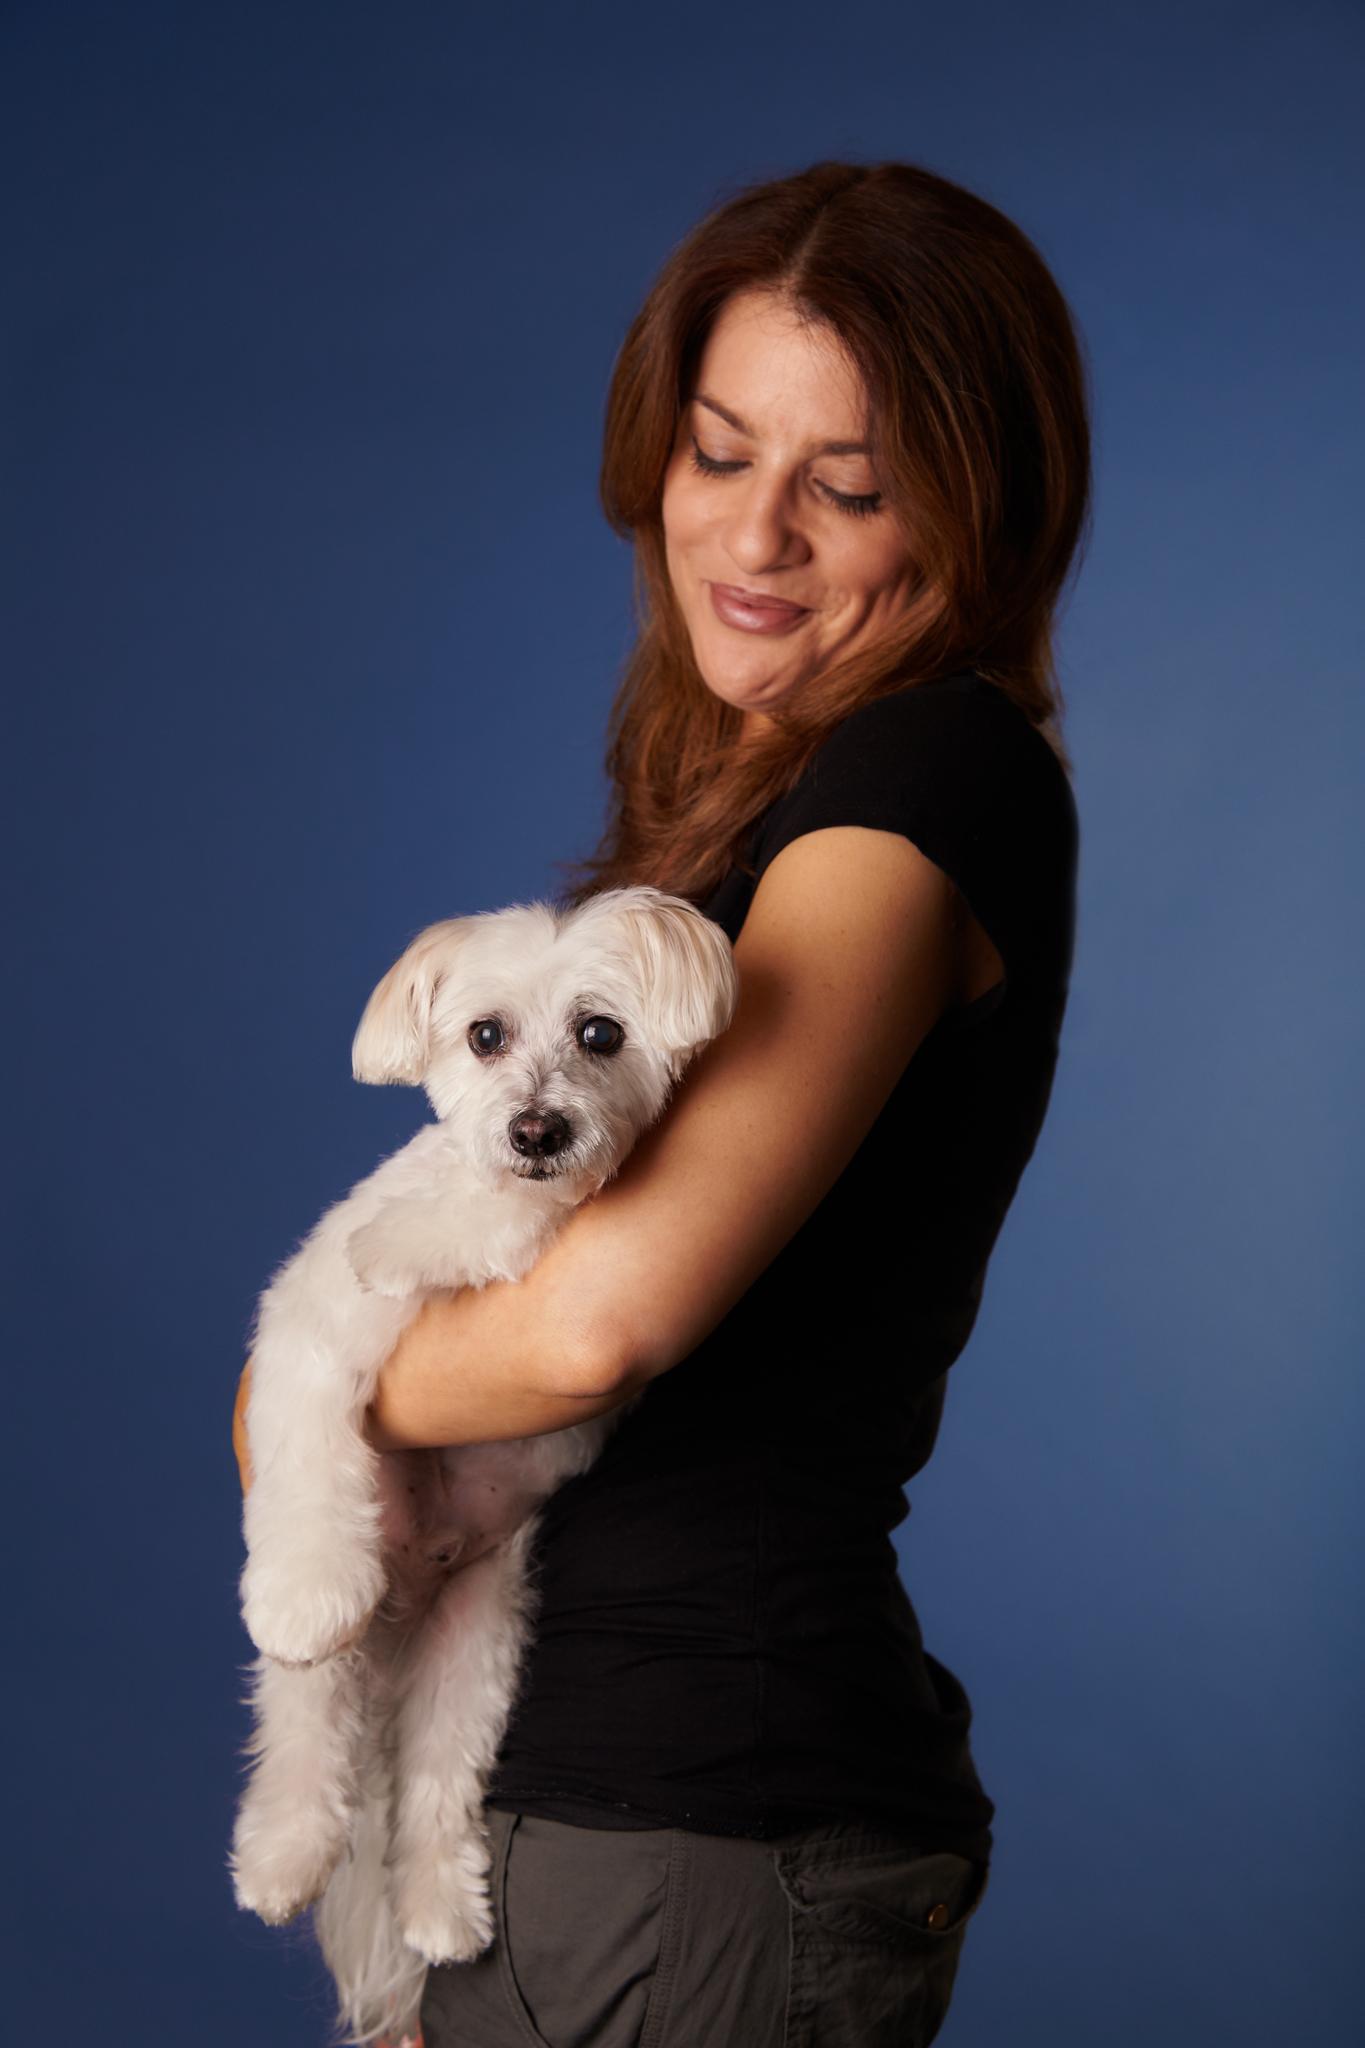 boprey-pet-photography-portrait-nyc_17.jpg